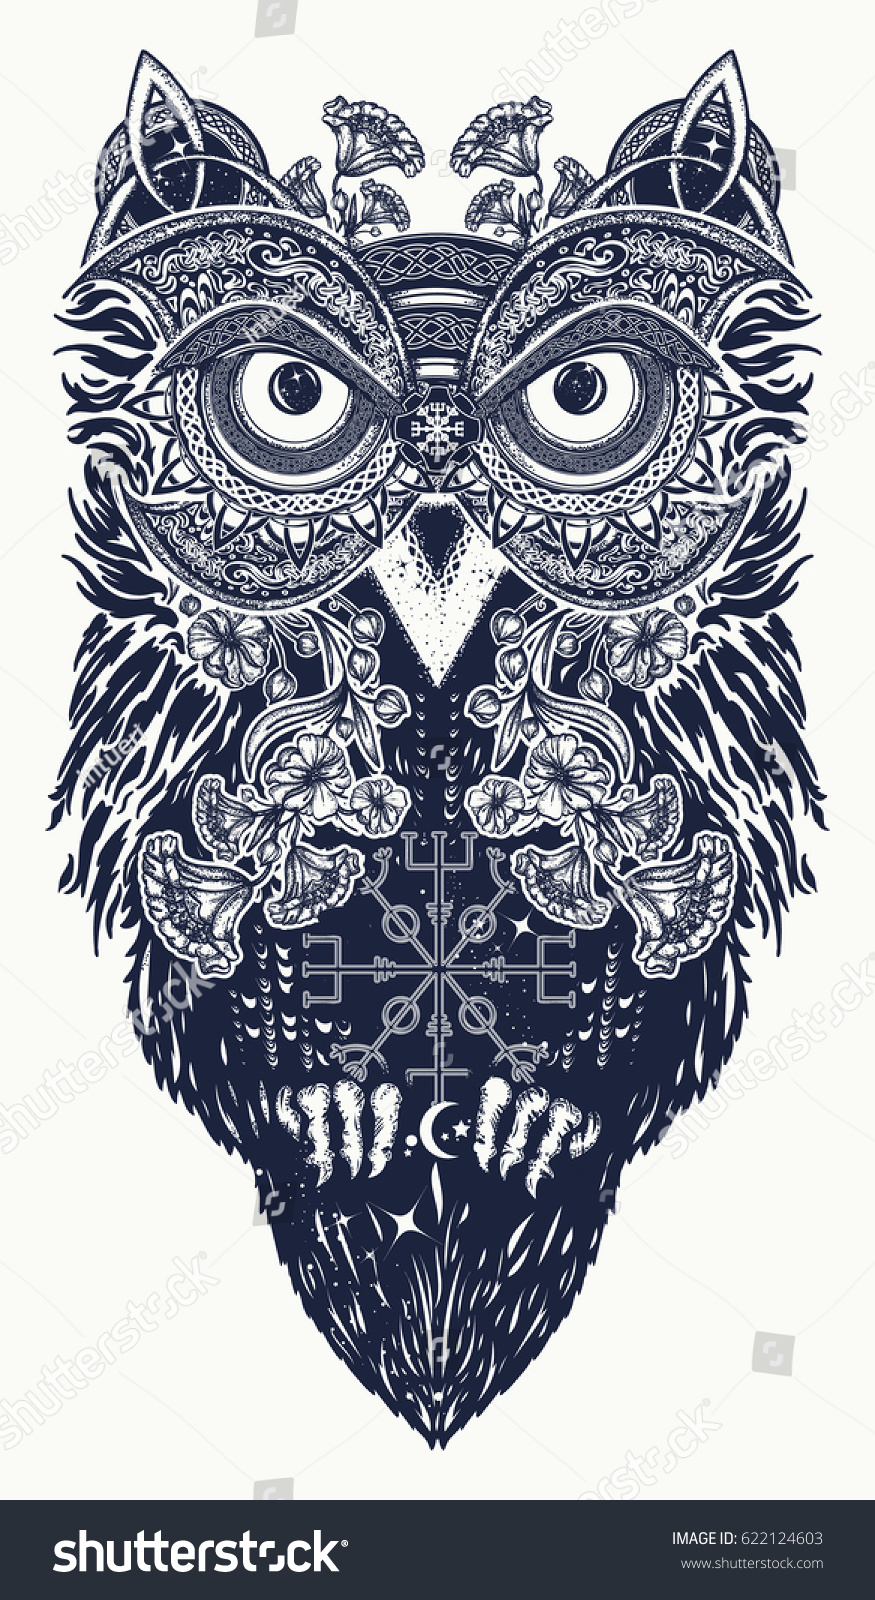 Owl tattoo art owl ethnic celtic stock vector 622124603 shutterstock owl in ethnic celtic style t shirt design owl tattoo biocorpaavc Gallery